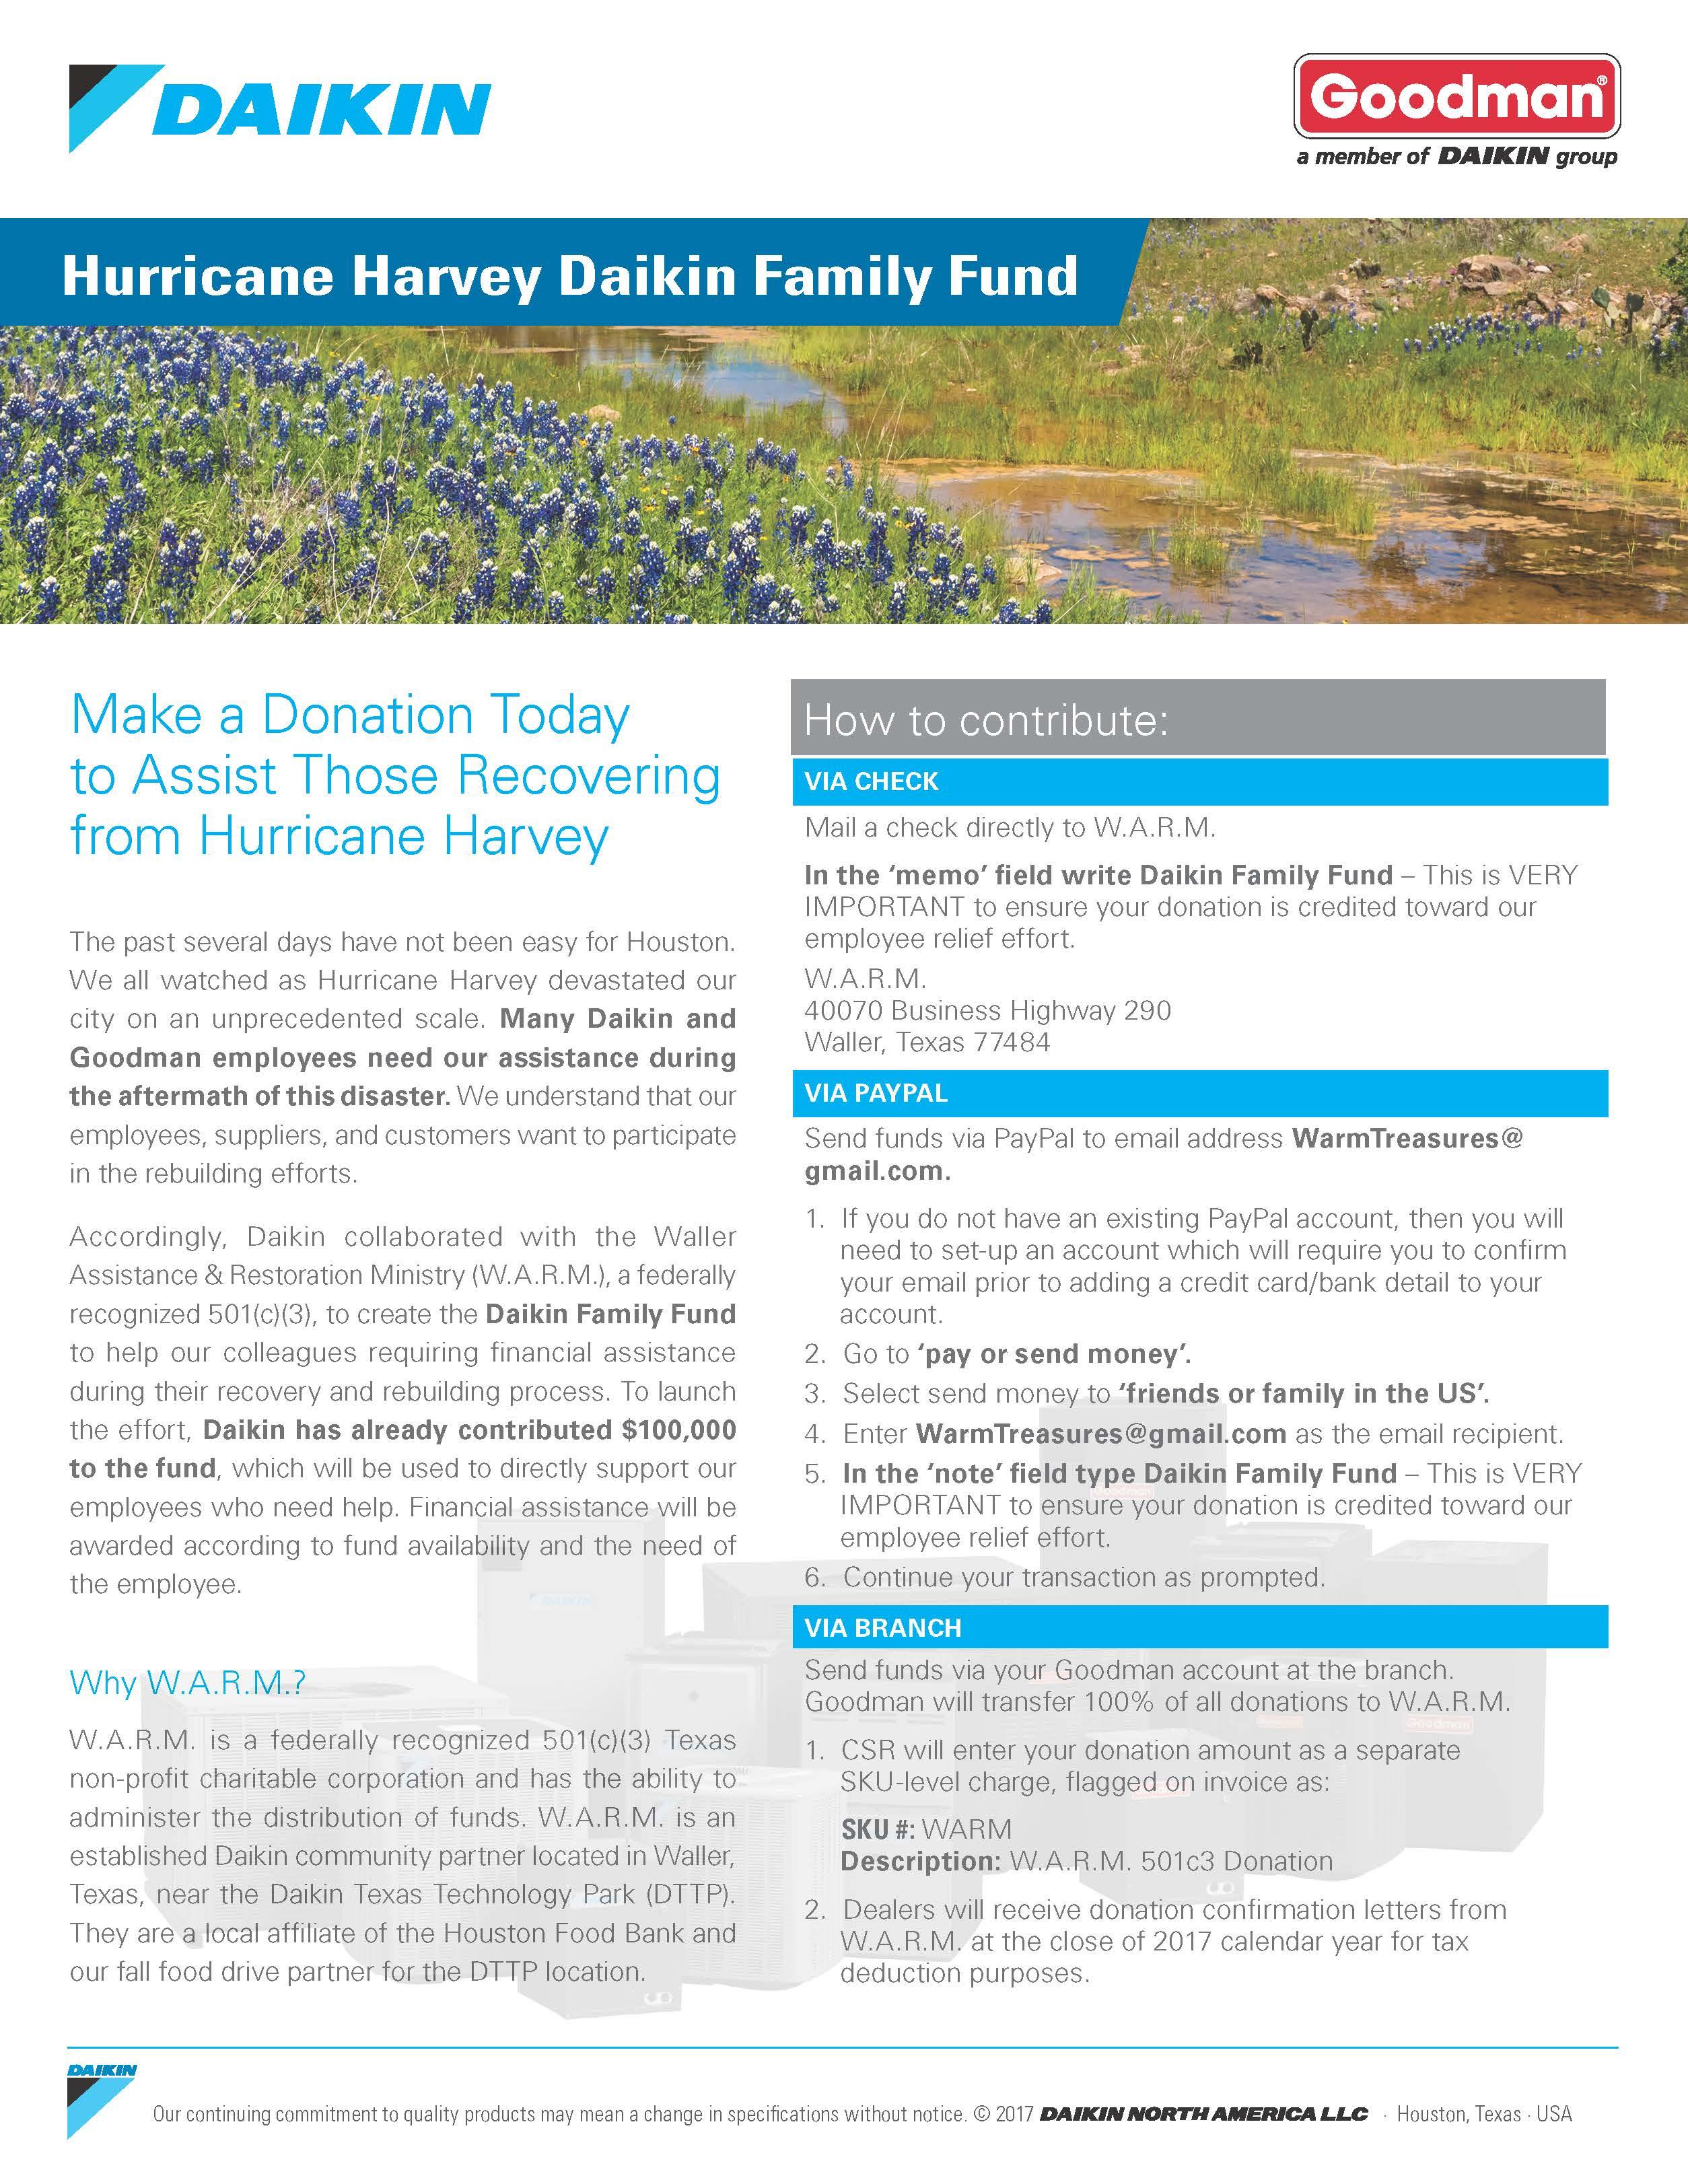 Daikin - WARM - Hurricane Harvey Relief Flyer - Air